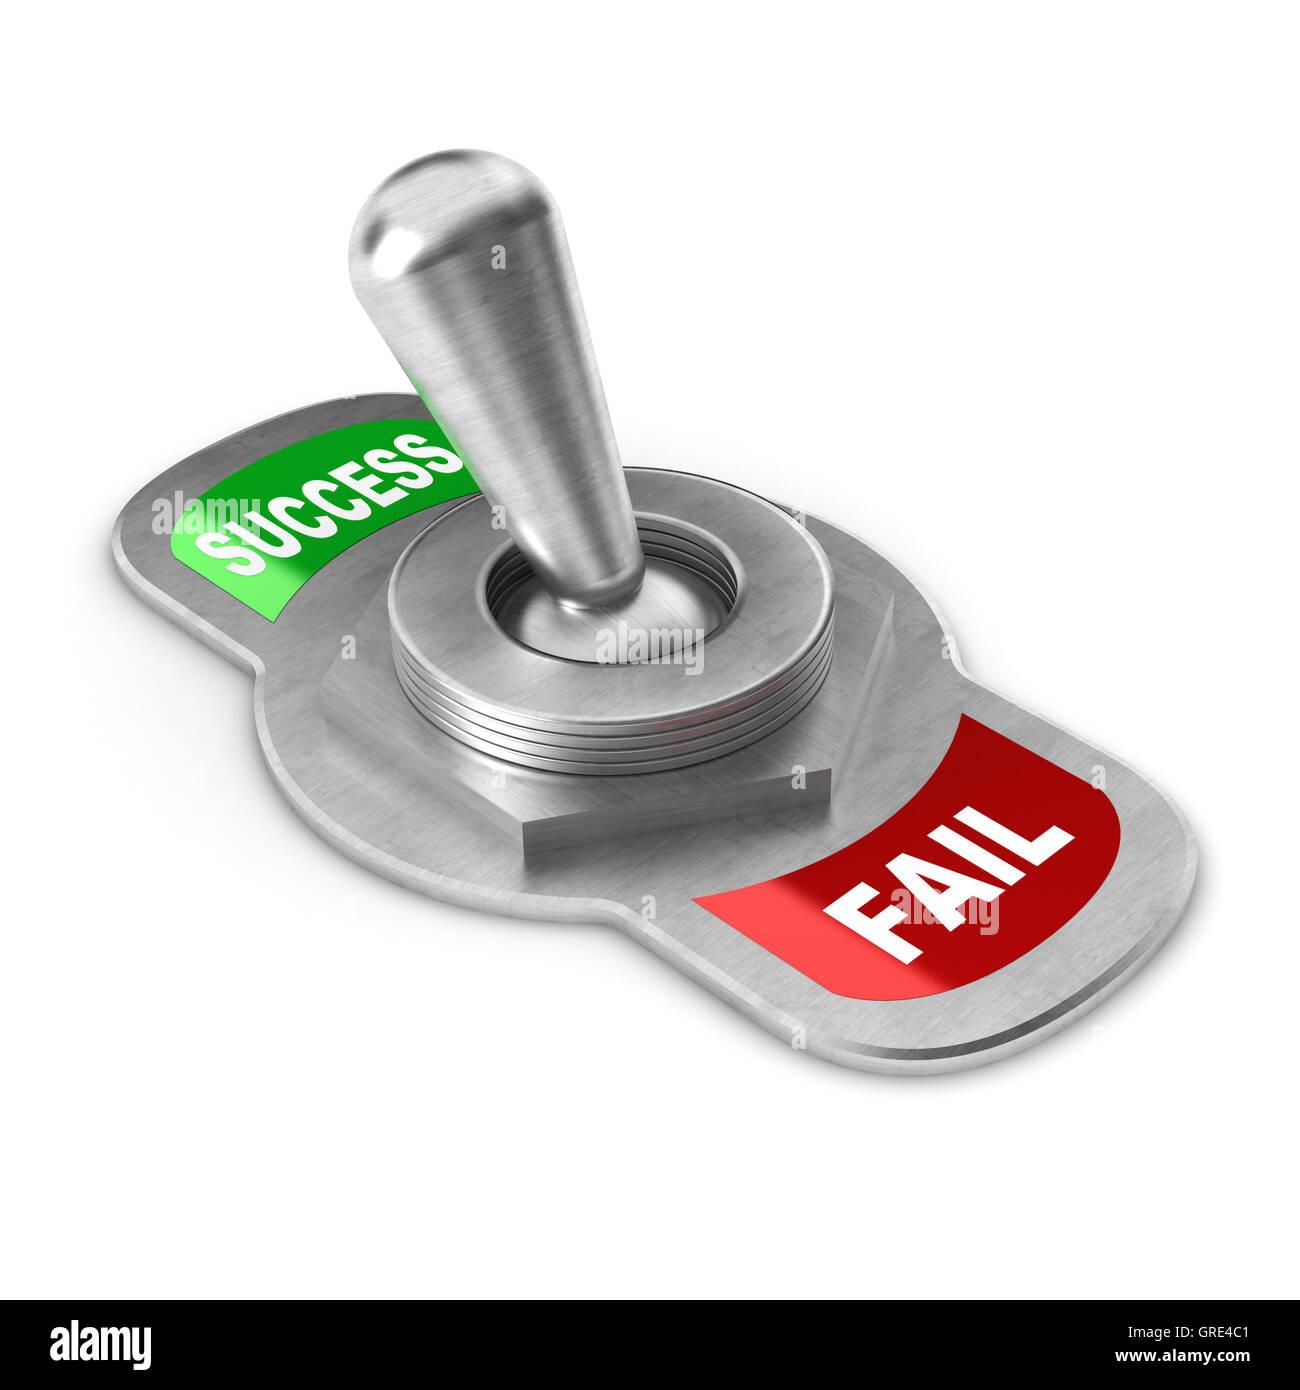 Success vs Fail Switch - Stock Image